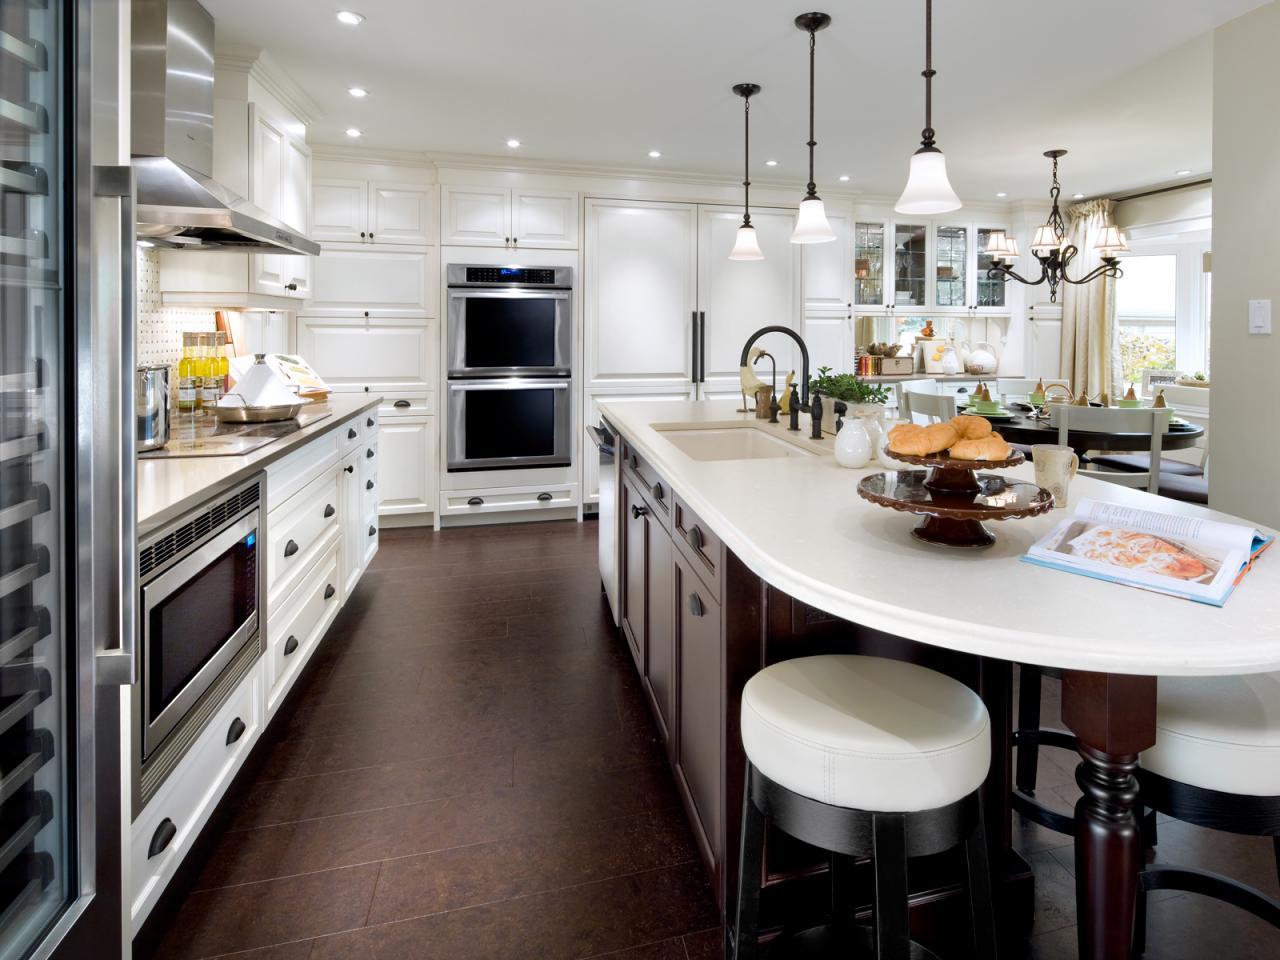 candice olson kitchen cabinets photo - 5